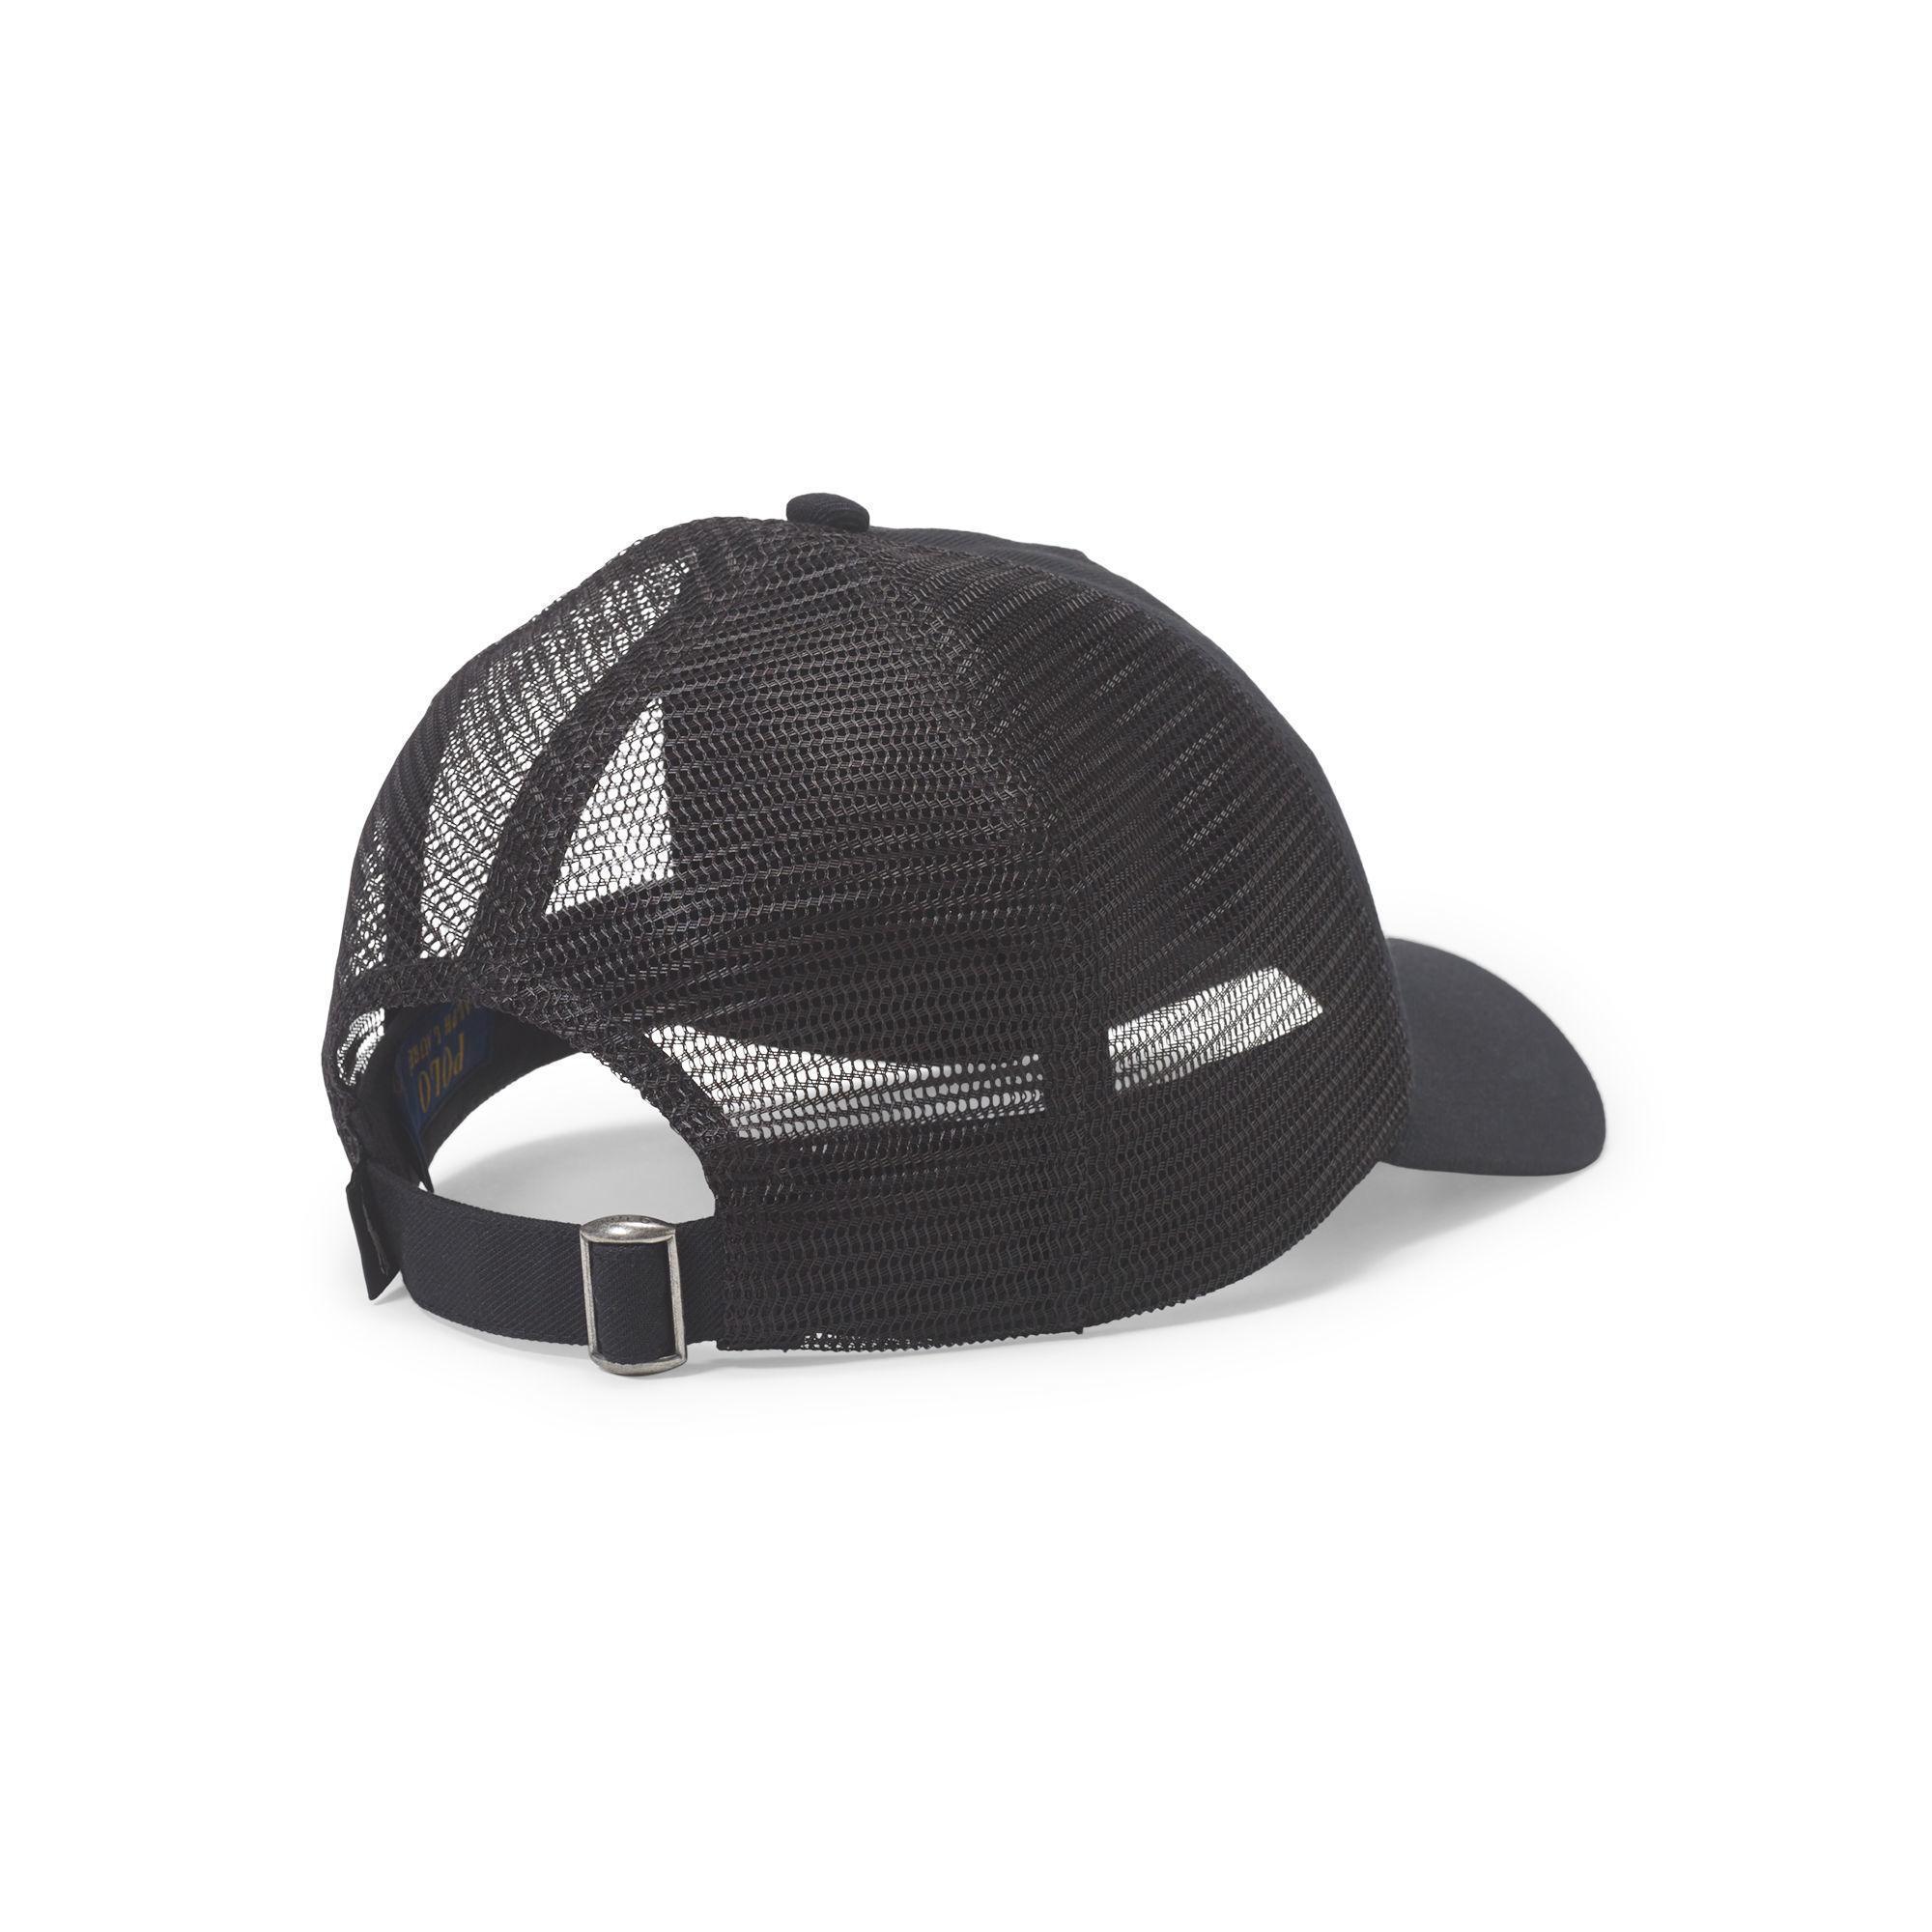 1aaf0dc675b Polo Ralph Lauren Sporty Mesh Trucker Hat in Black for Men - Lyst